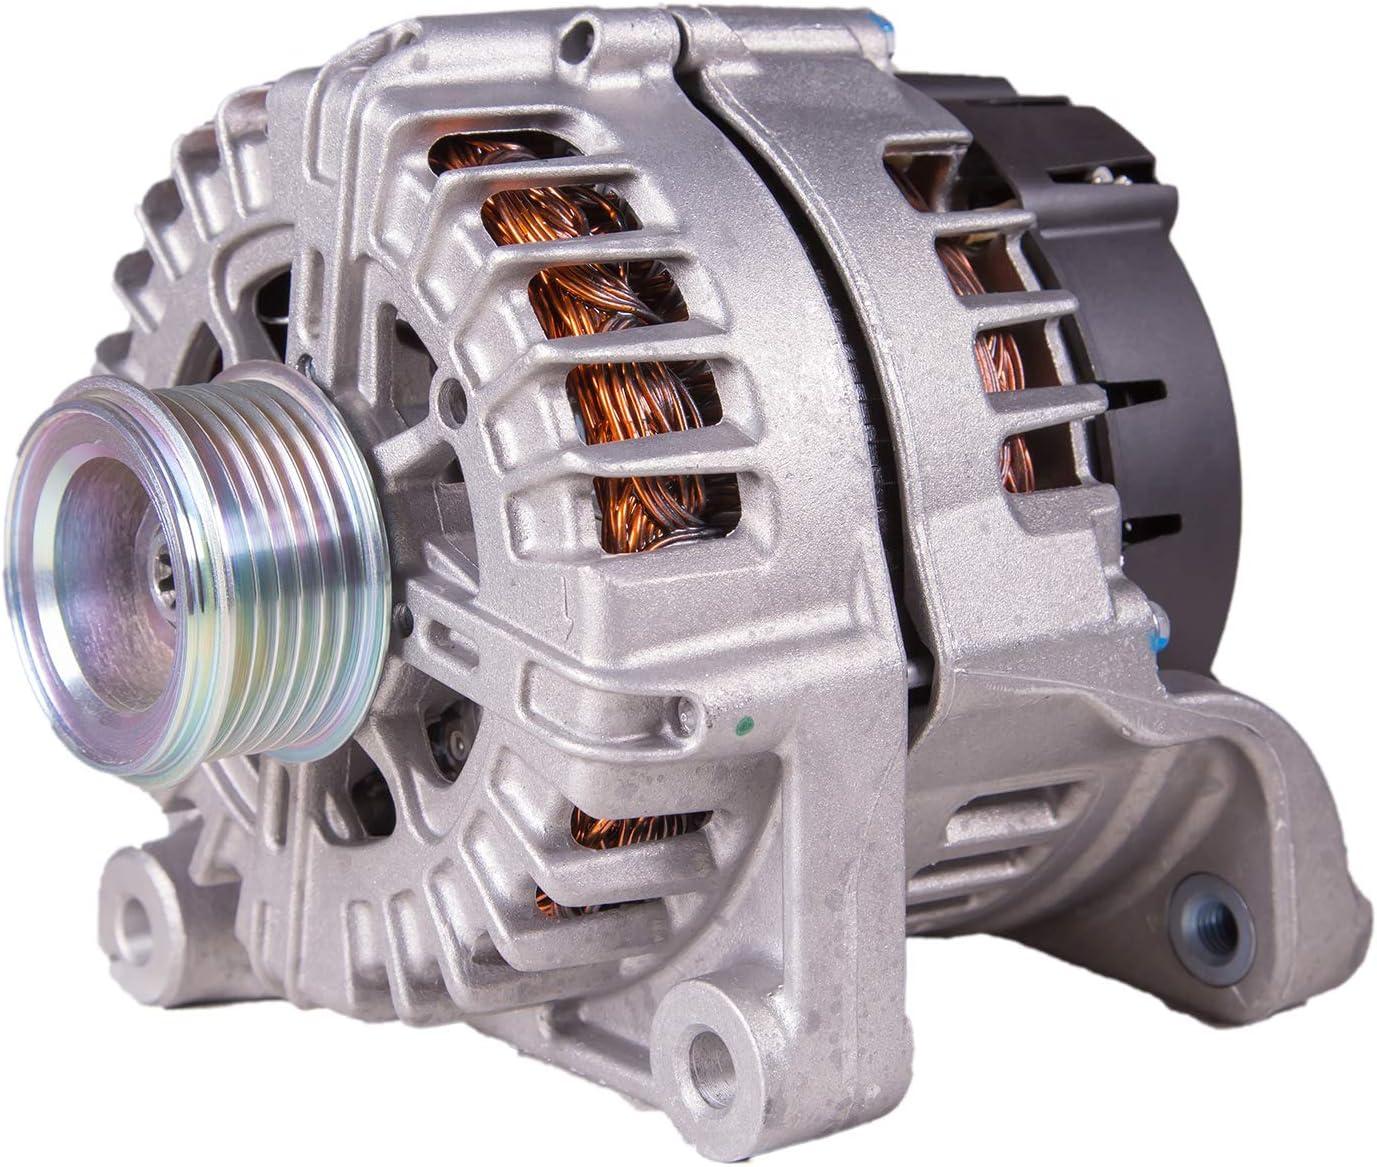 2014-2018 Valeo 439833 New Premium Alternator Replacement for BMW X5